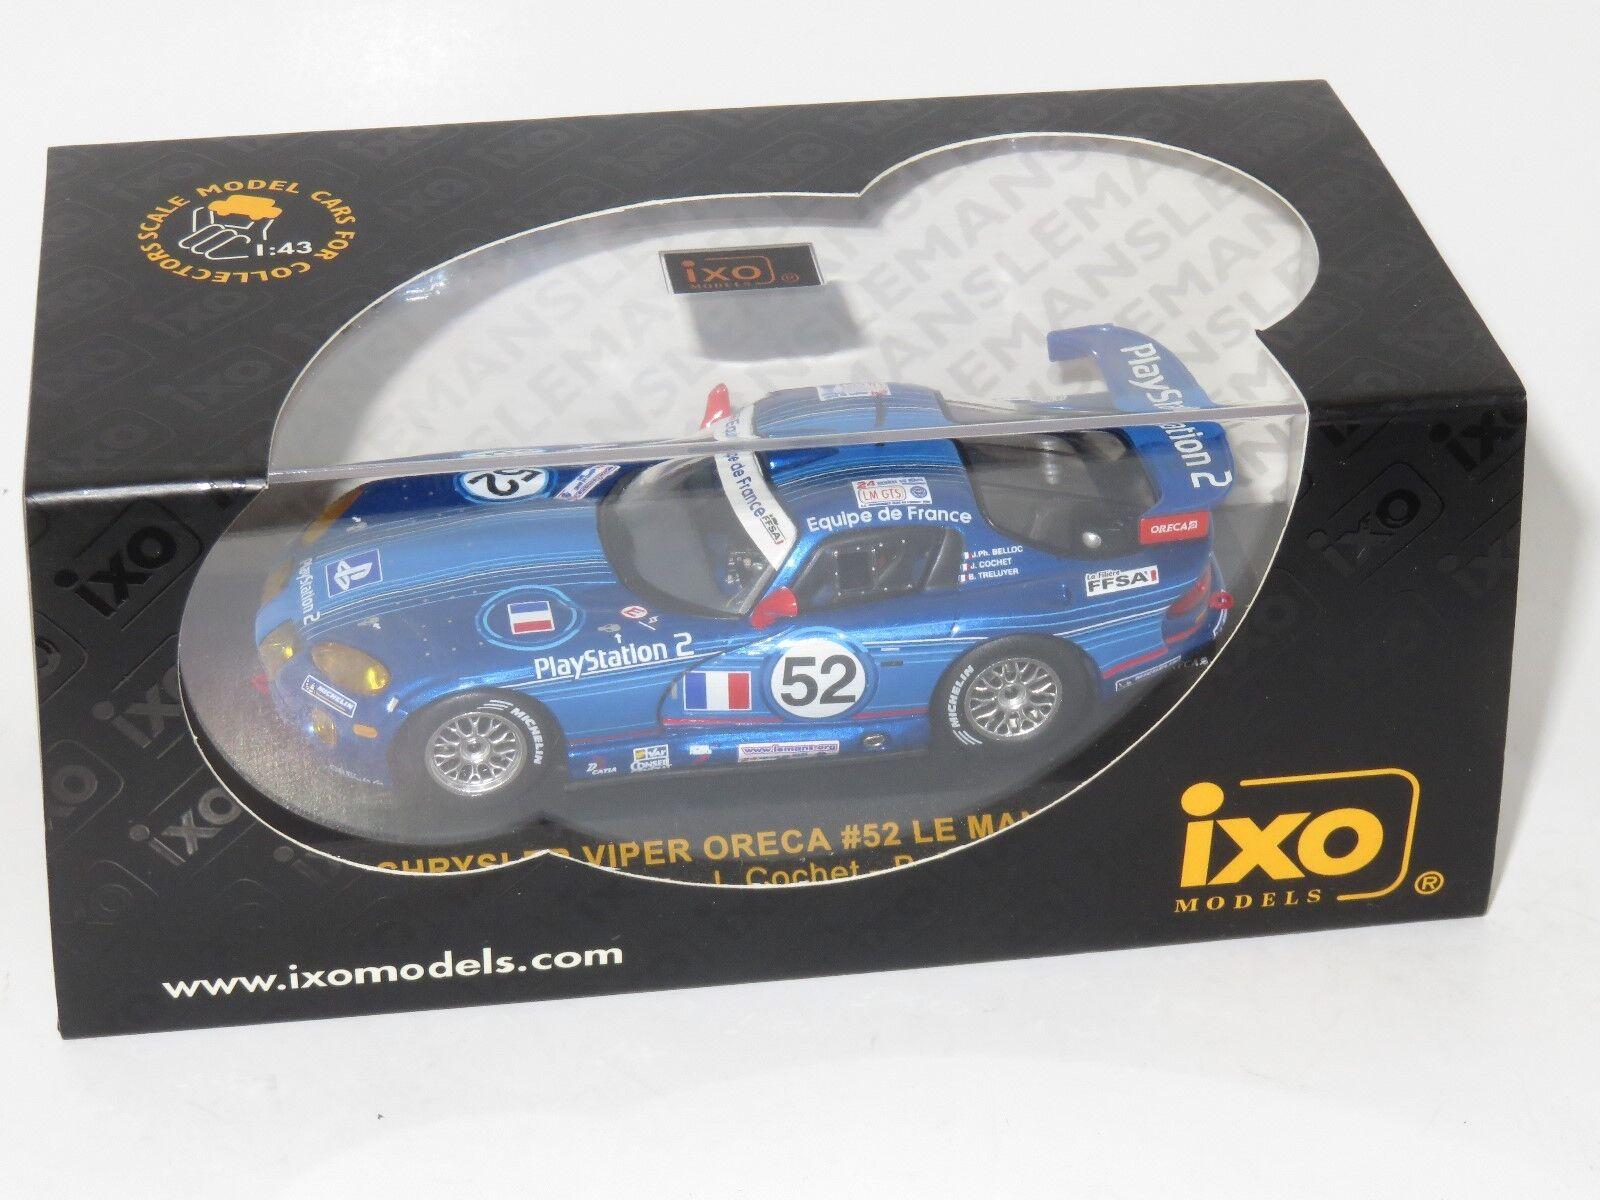 1 43 CHRYSLER VIPER GTS-R Le Mans 24 hrs 2002  52 Oreca Playstation